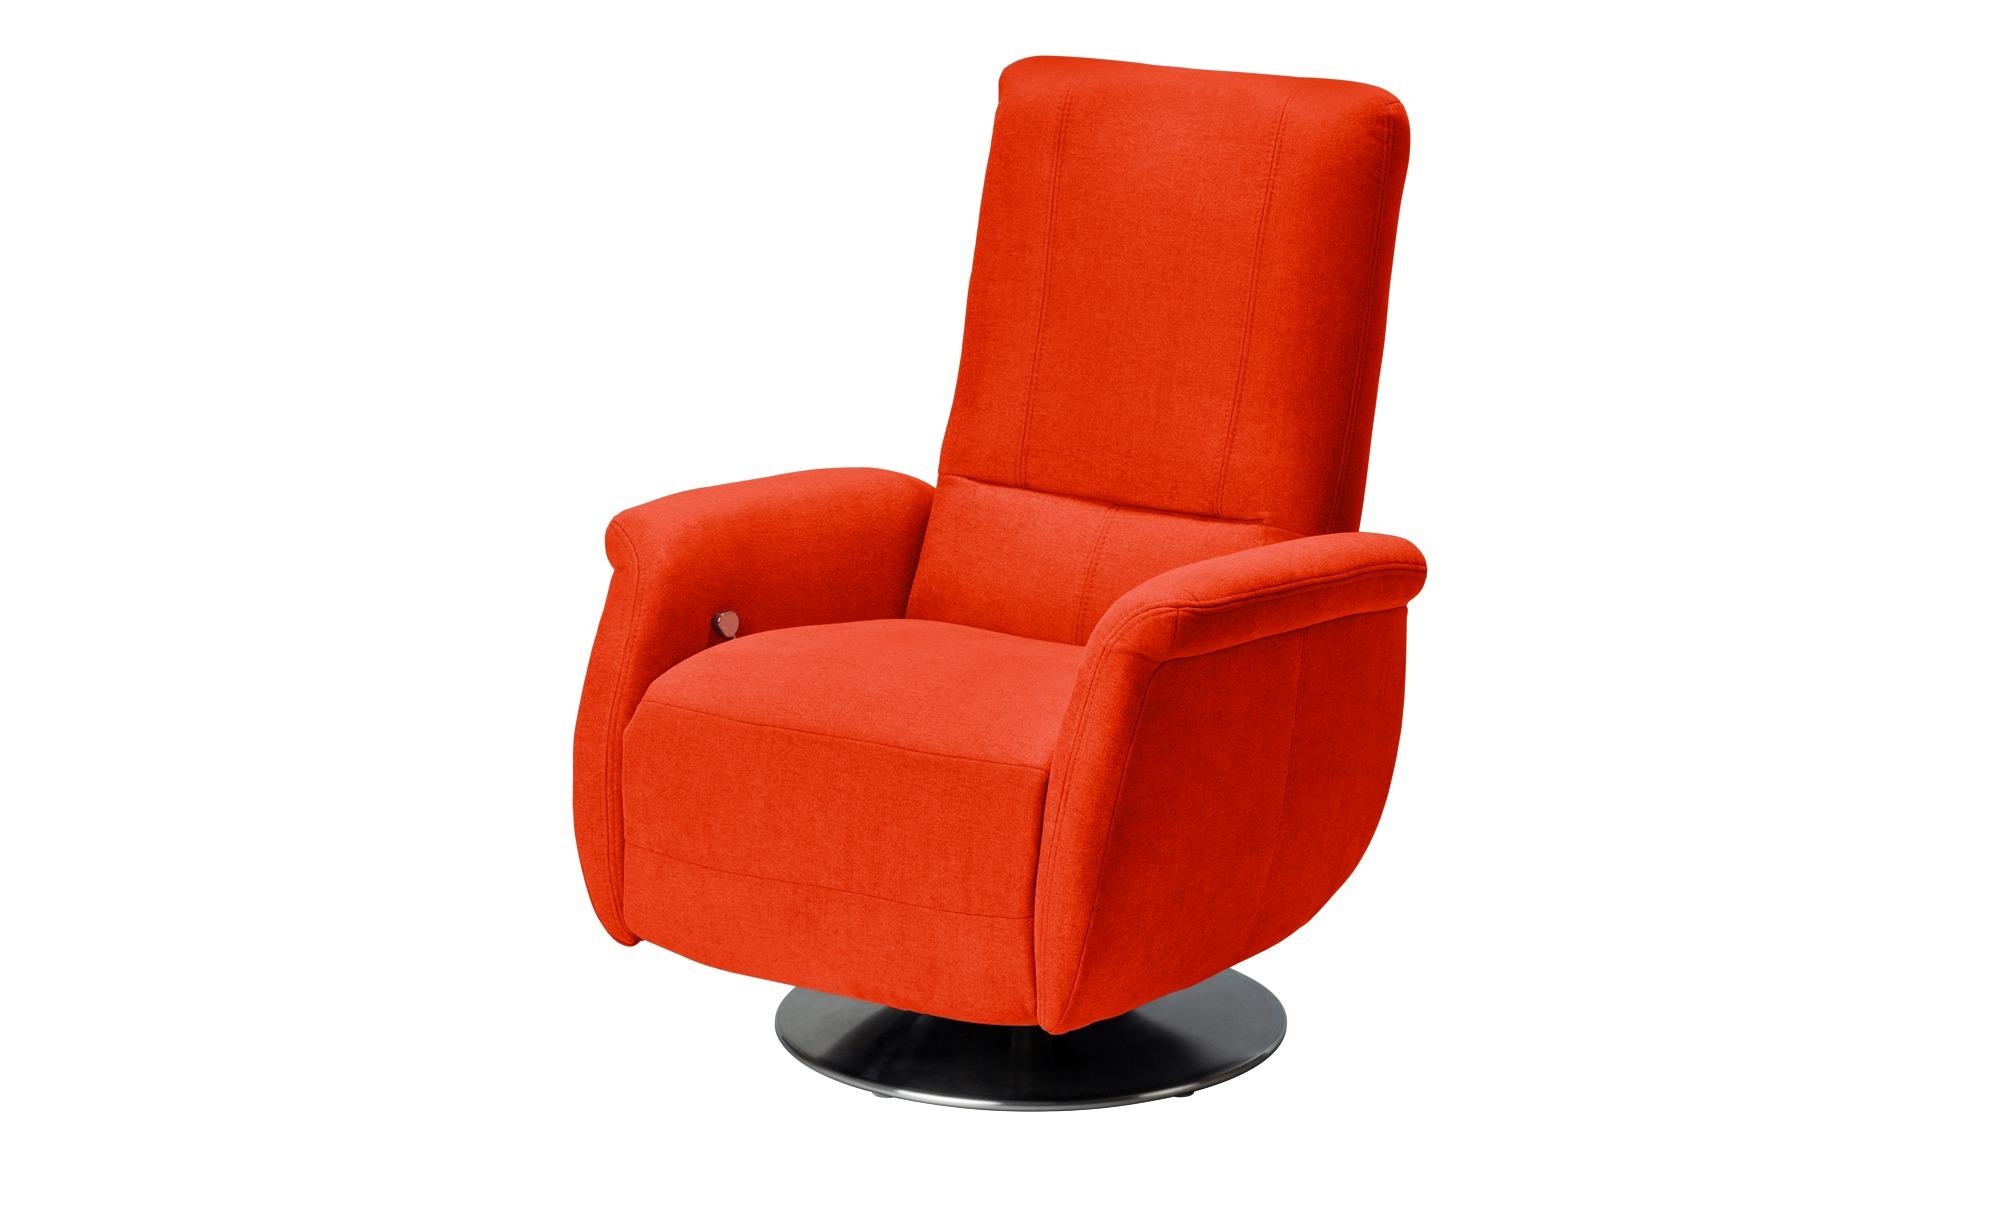 meinSofa Relaxsessel orange - Stoff Felix-S ¦ orange Polstermöbel > Sessel > Fernsehsessel - Höffner